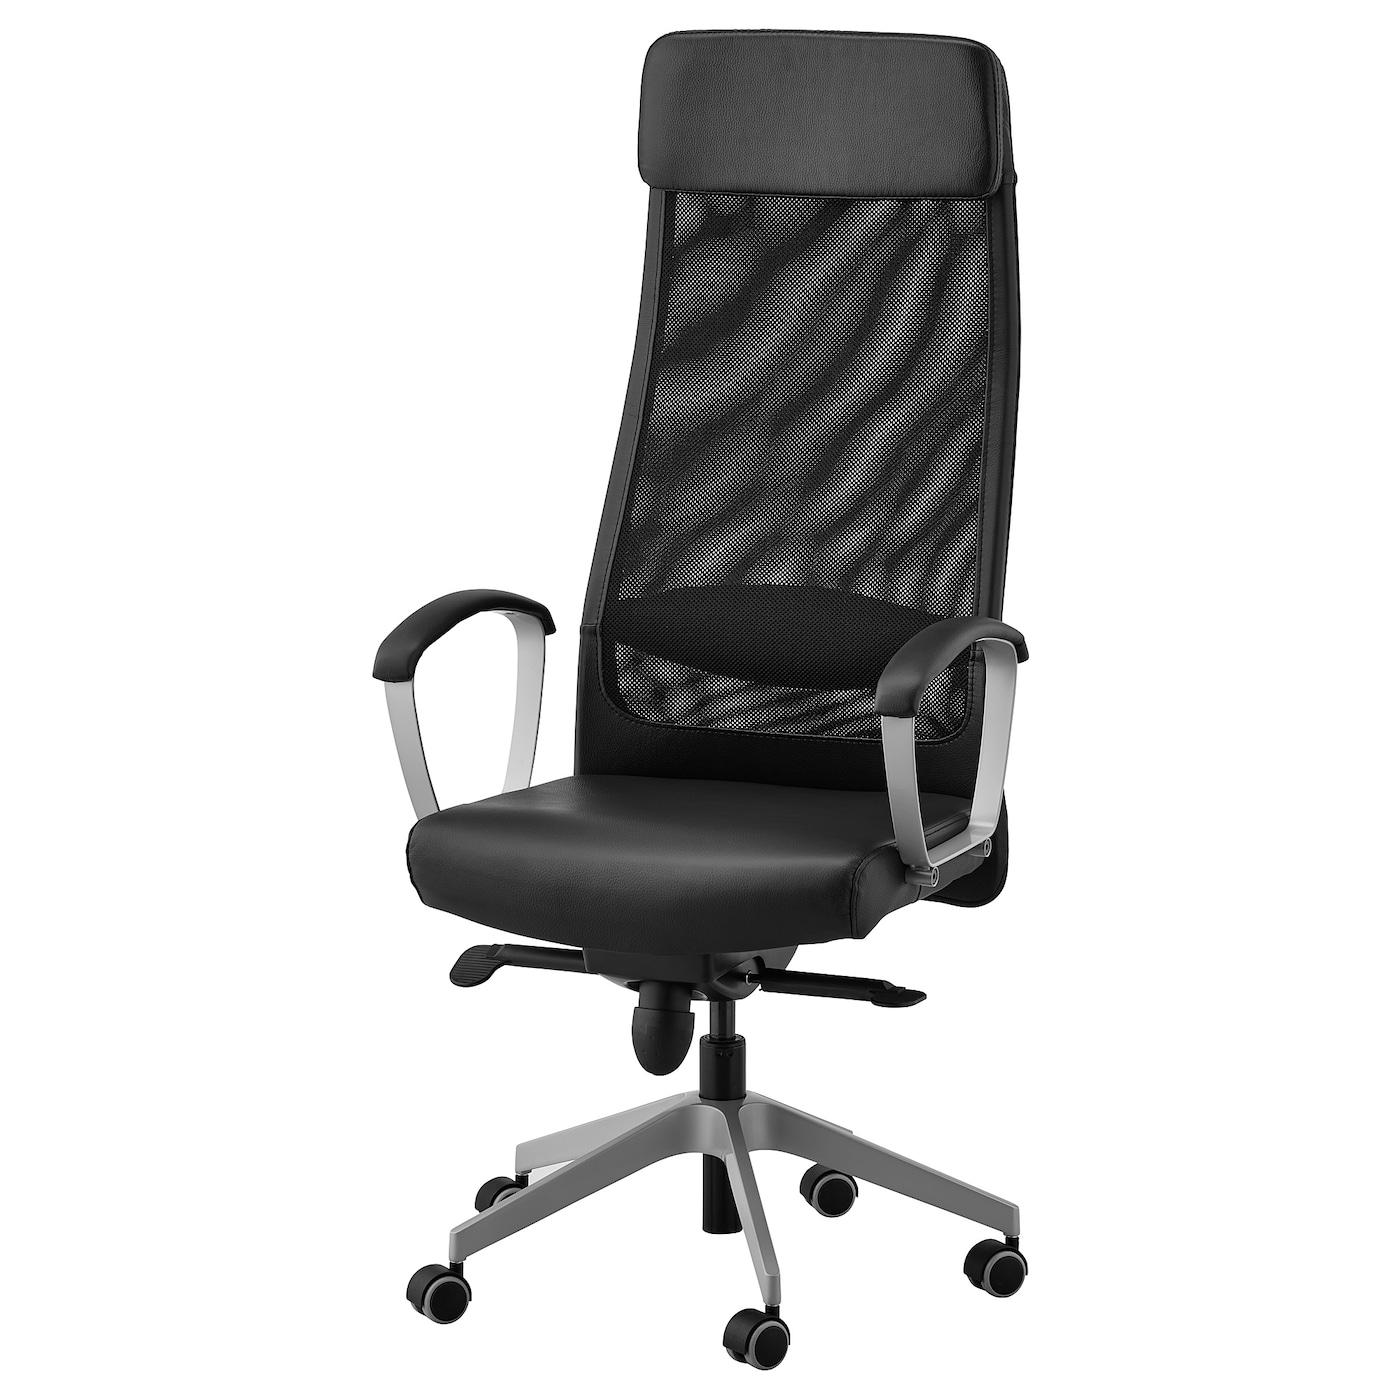 Burostuhl Berlin Drehstuhl Rollstuhl Chefsessel Schreibtischstuhl Stuhl Buro Neu